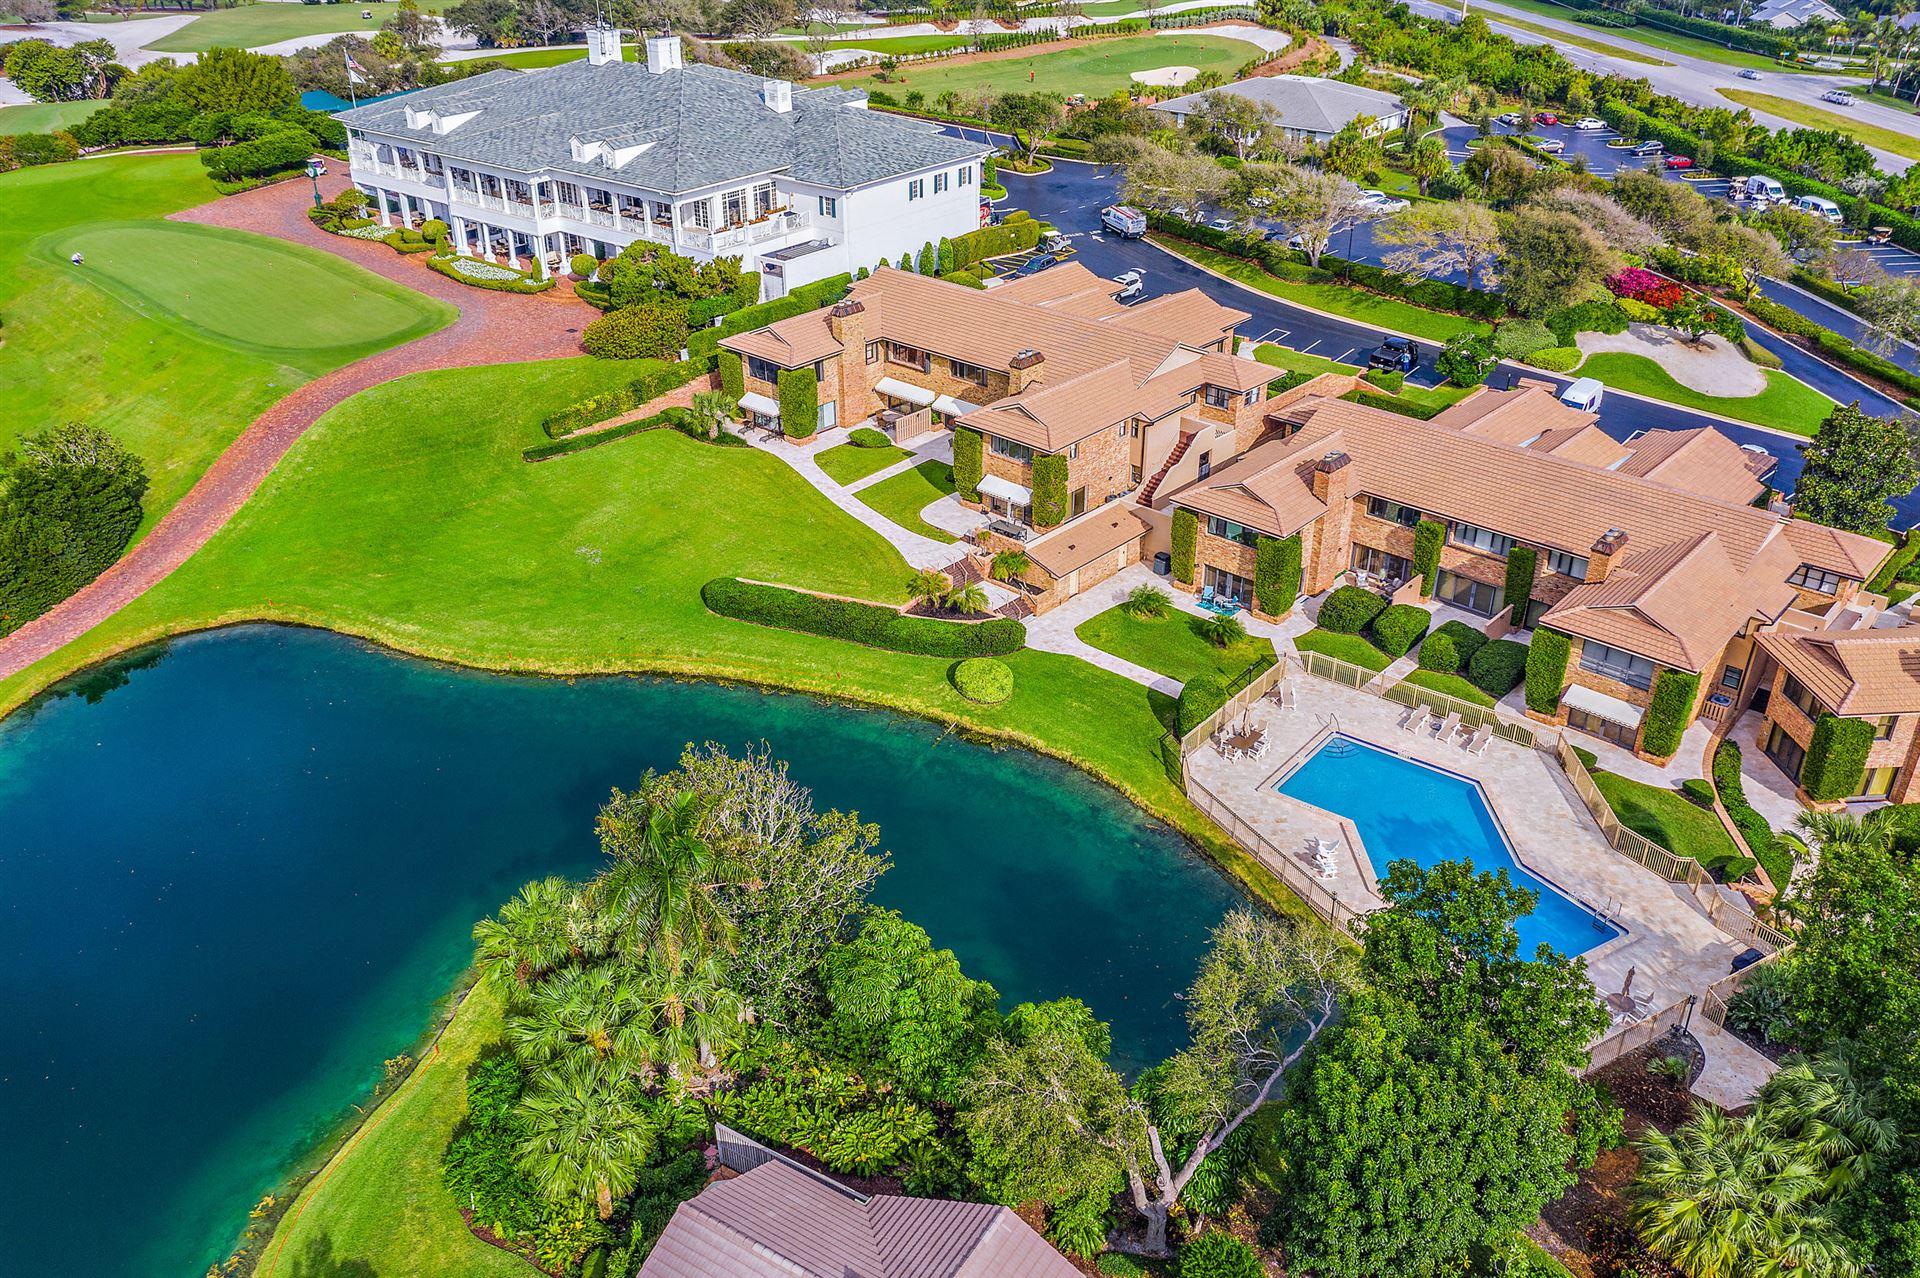 Photo of 11830 SE Hill Club Terrace #305, Tequesta, FL 33469 (MLS # RX-10680050)